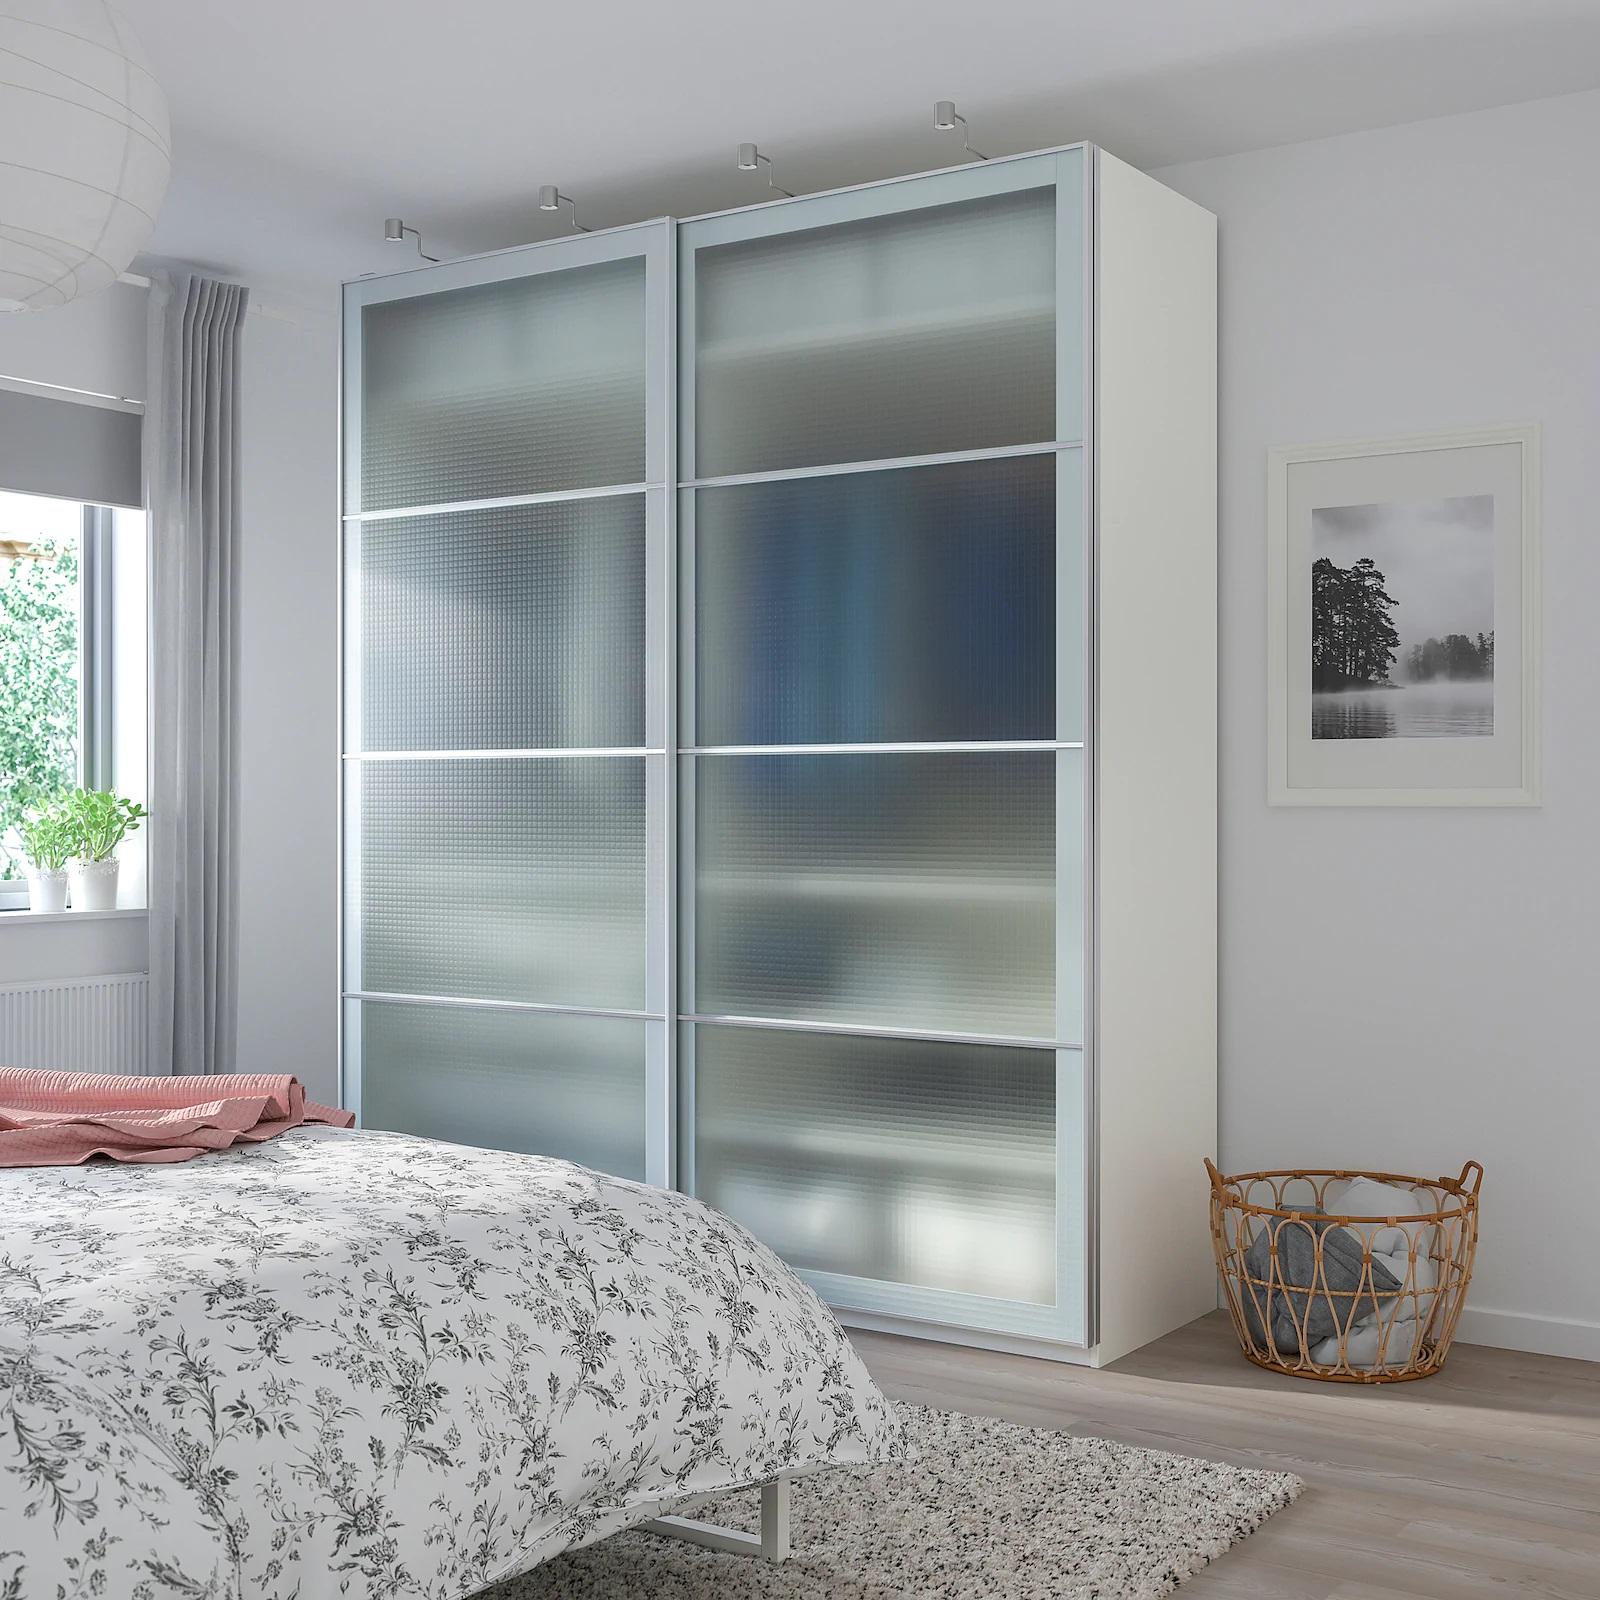 Шкафы икеа - каталог, фото, цены